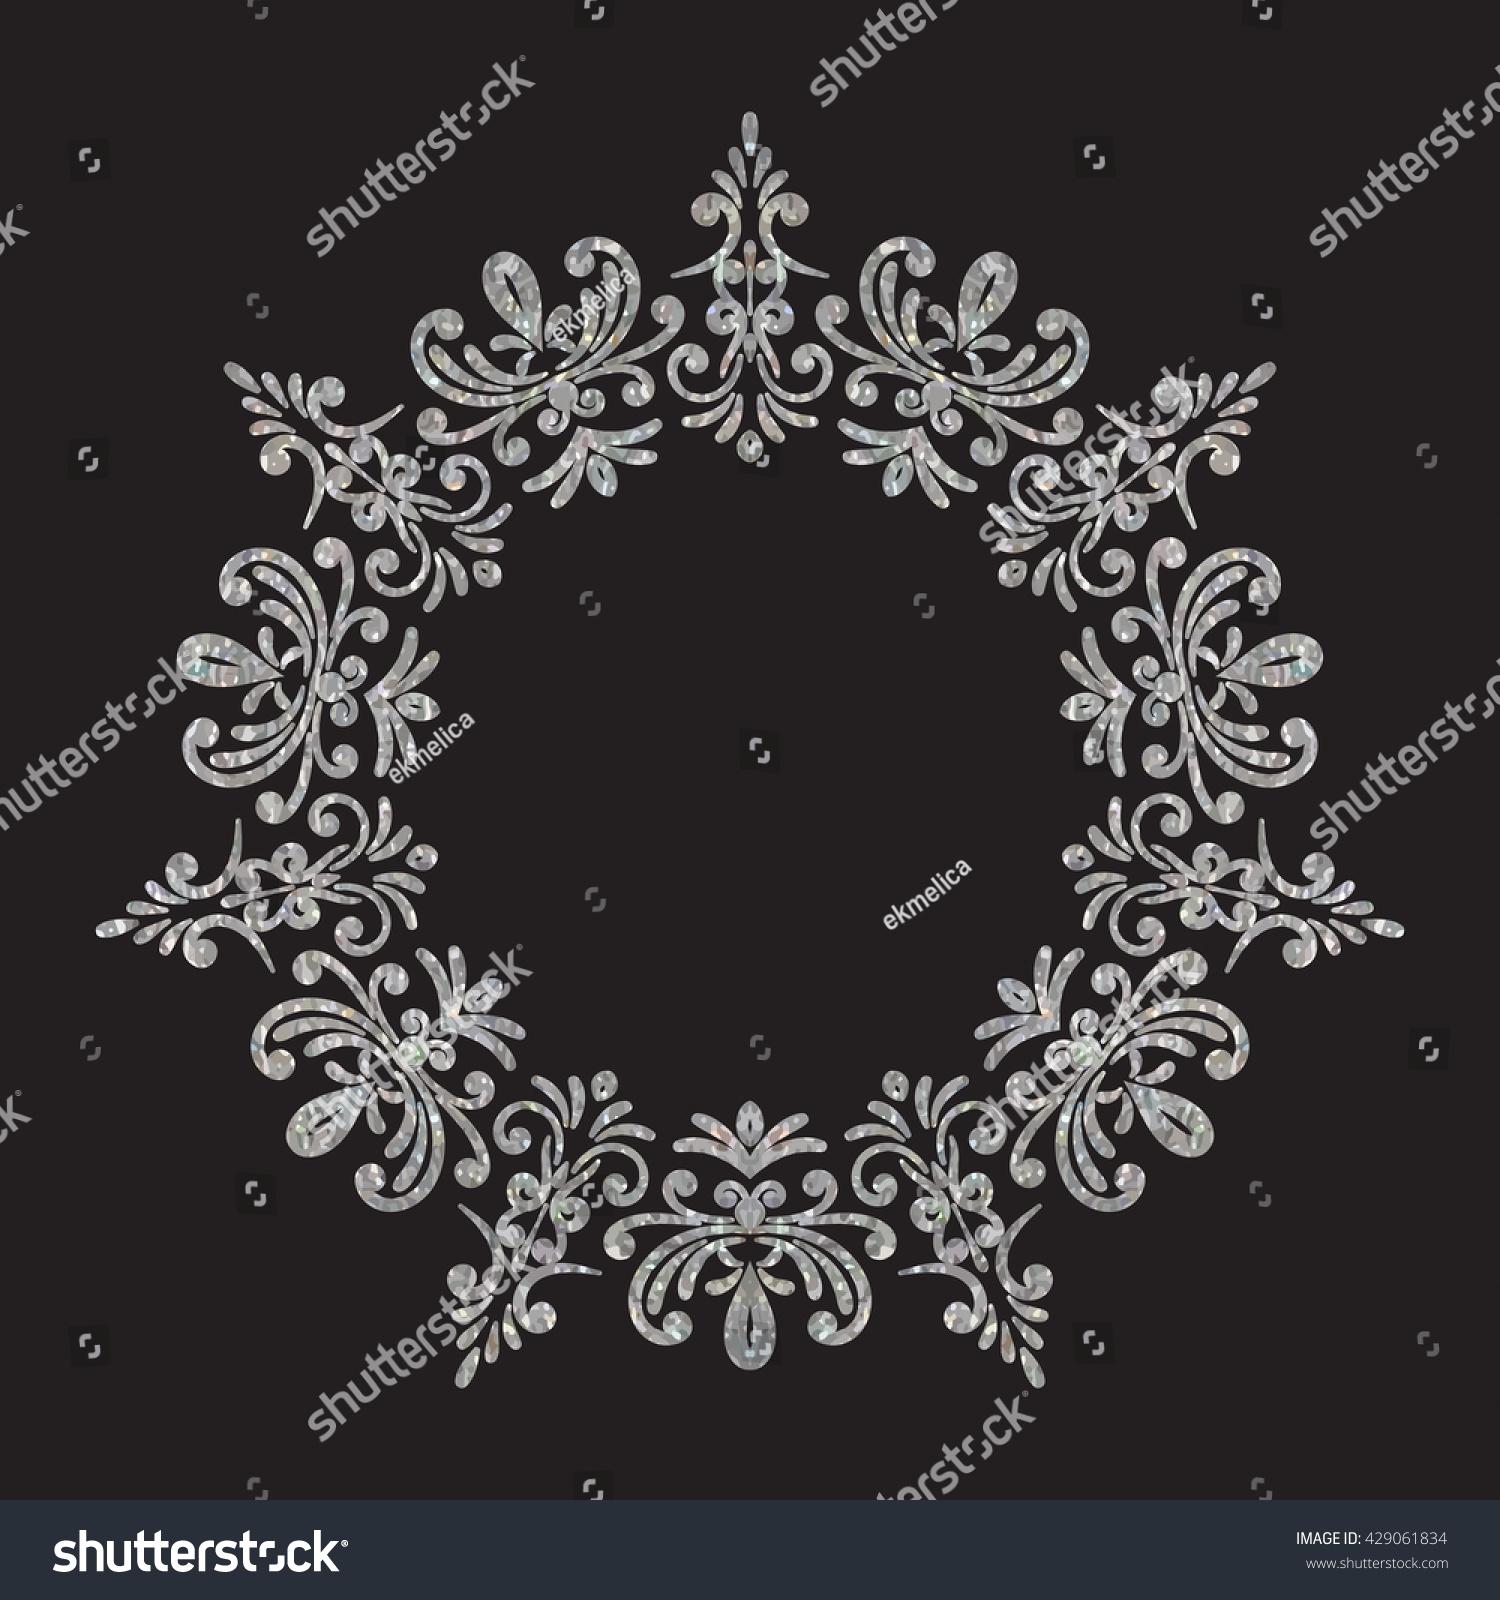 Elegant luxury vintage circle silver floral frame on black background. Refined  hand drawn border template 15bbf34023